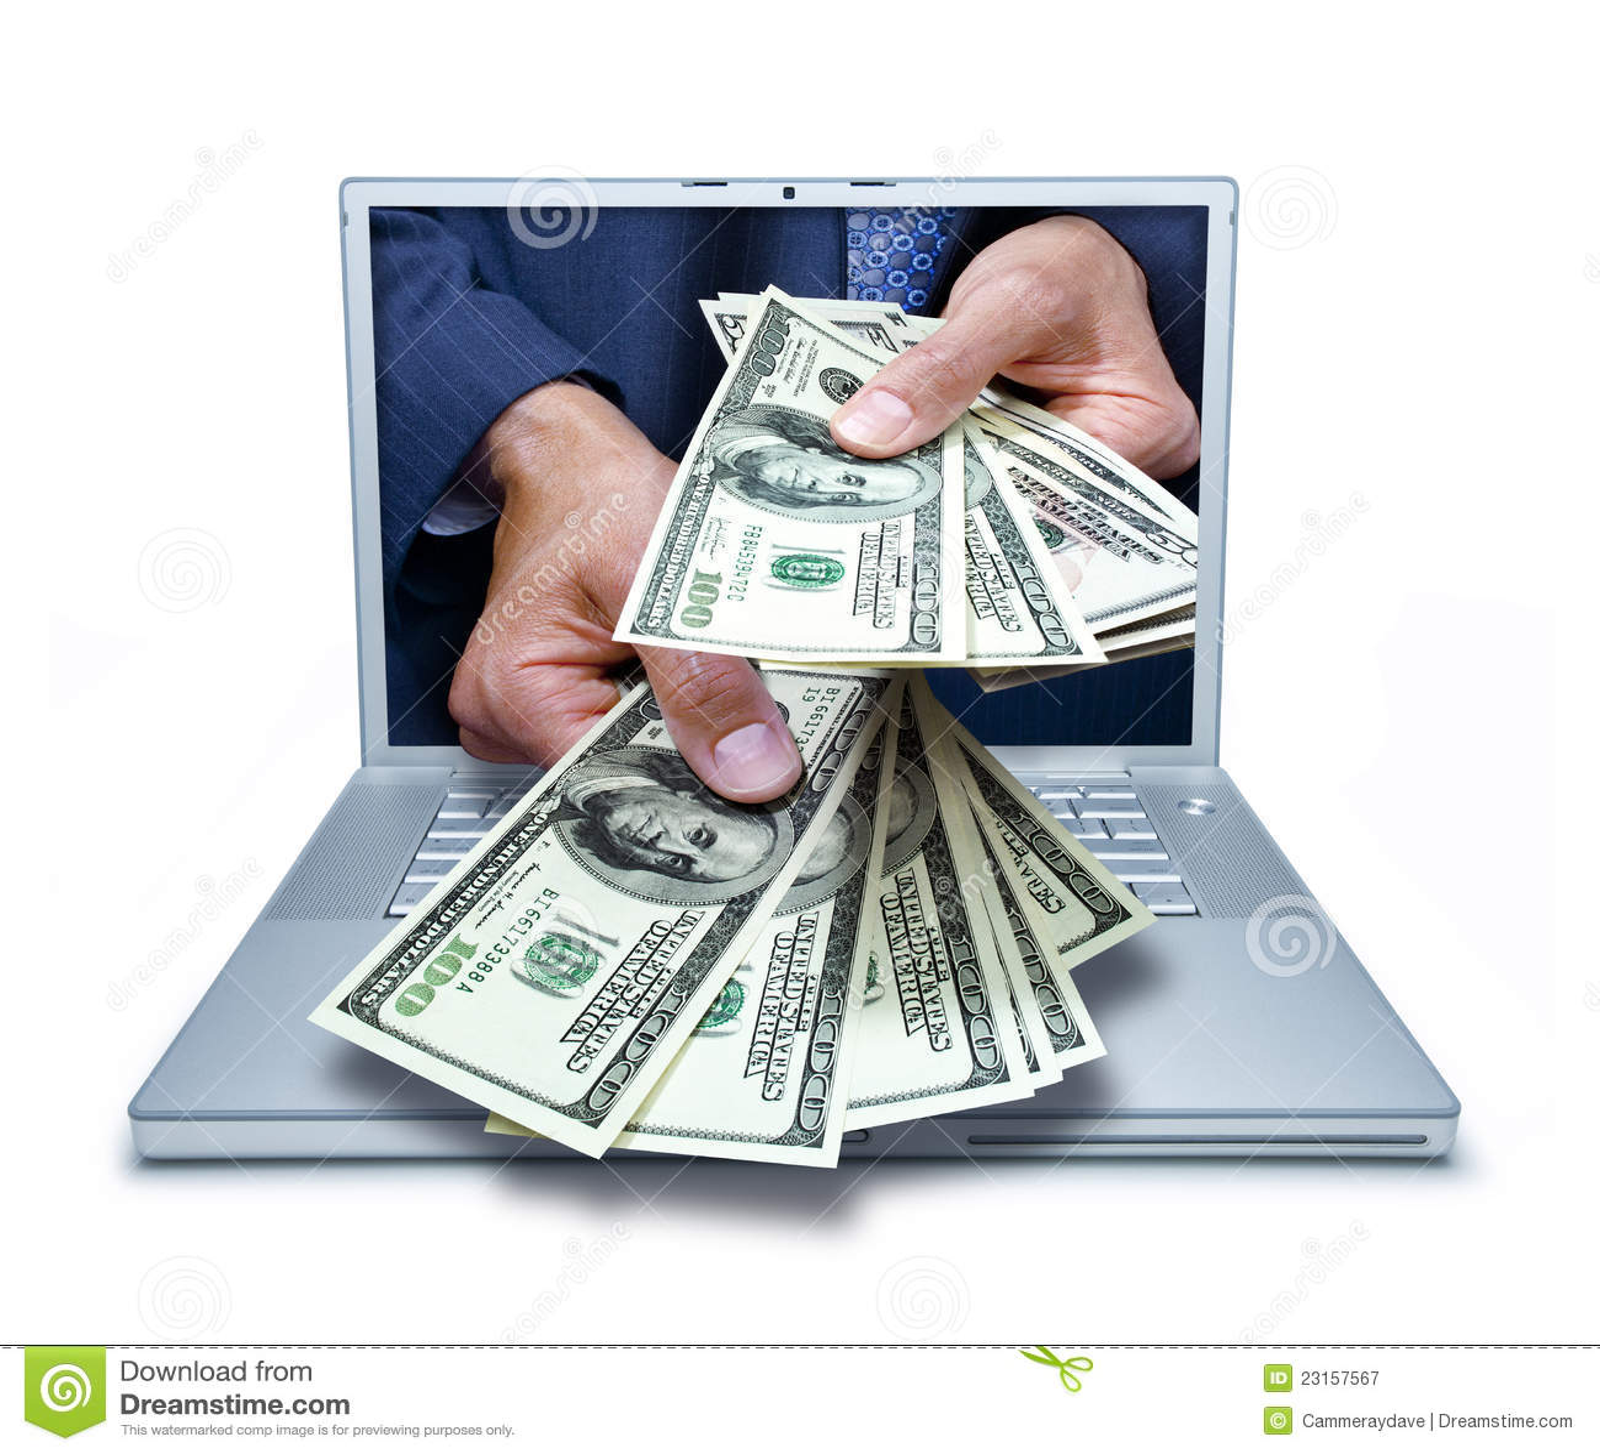 займ легкие деньги онлайн